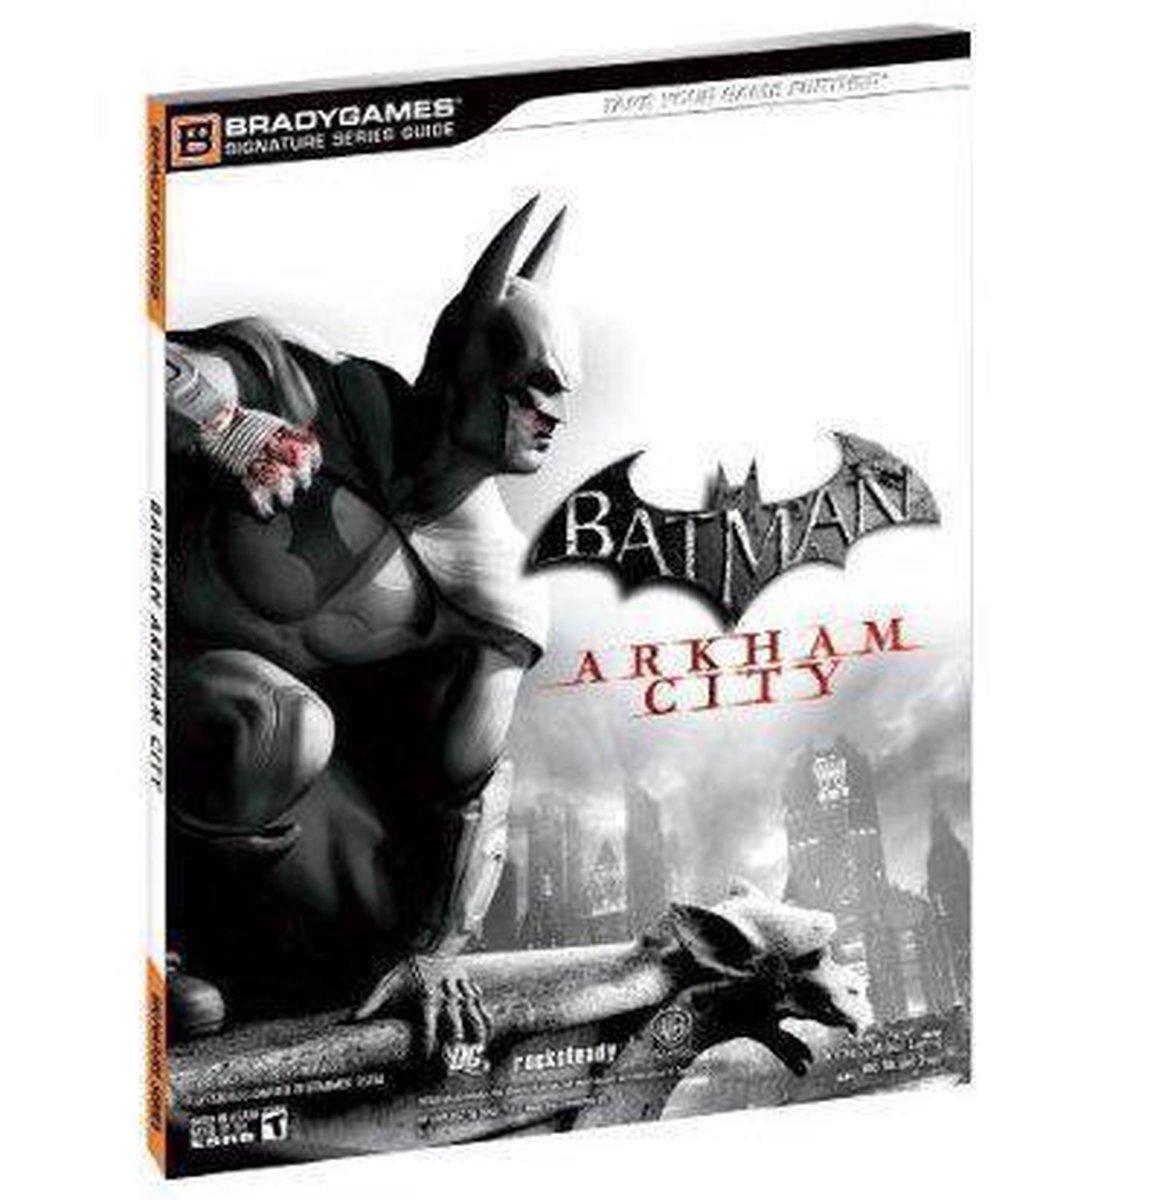 Batman, Arkham City, Signature Series Guide (PS3 / Xbox 360)